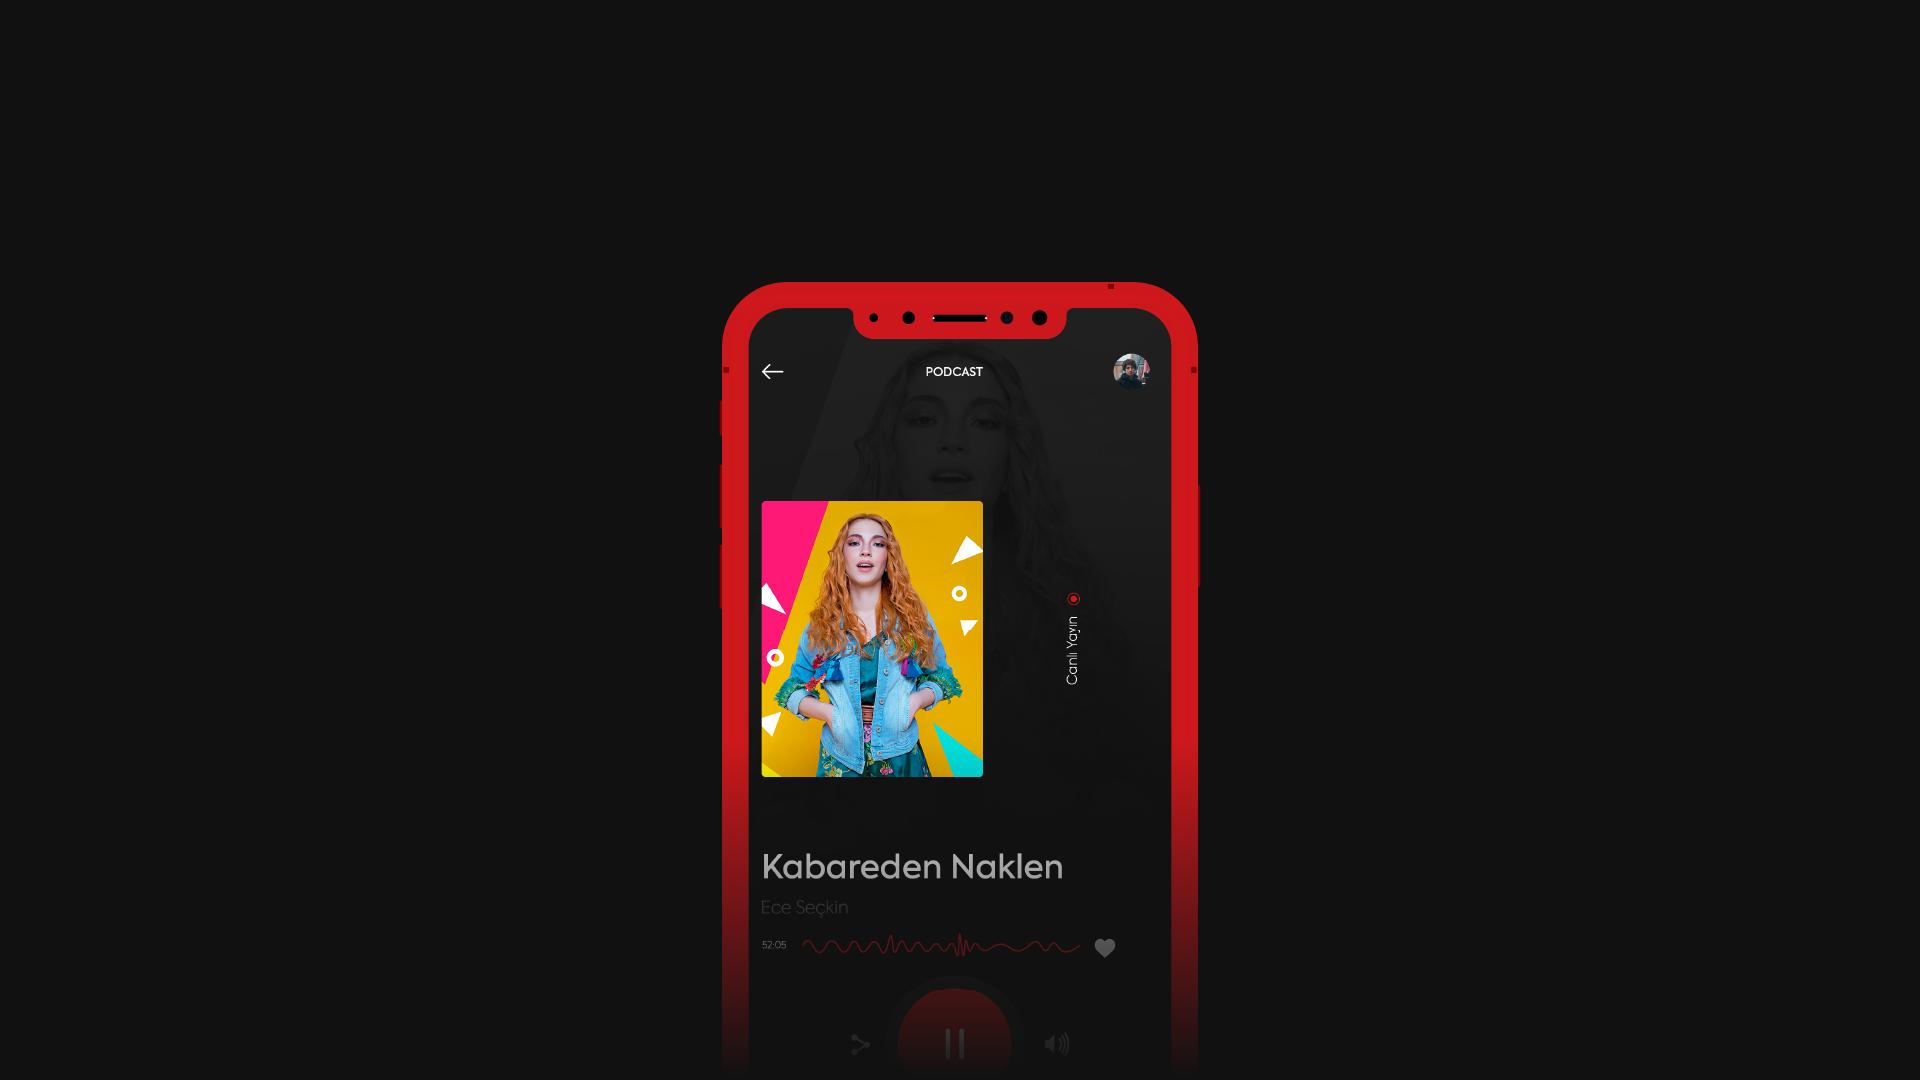 Show Radyo Uygulama